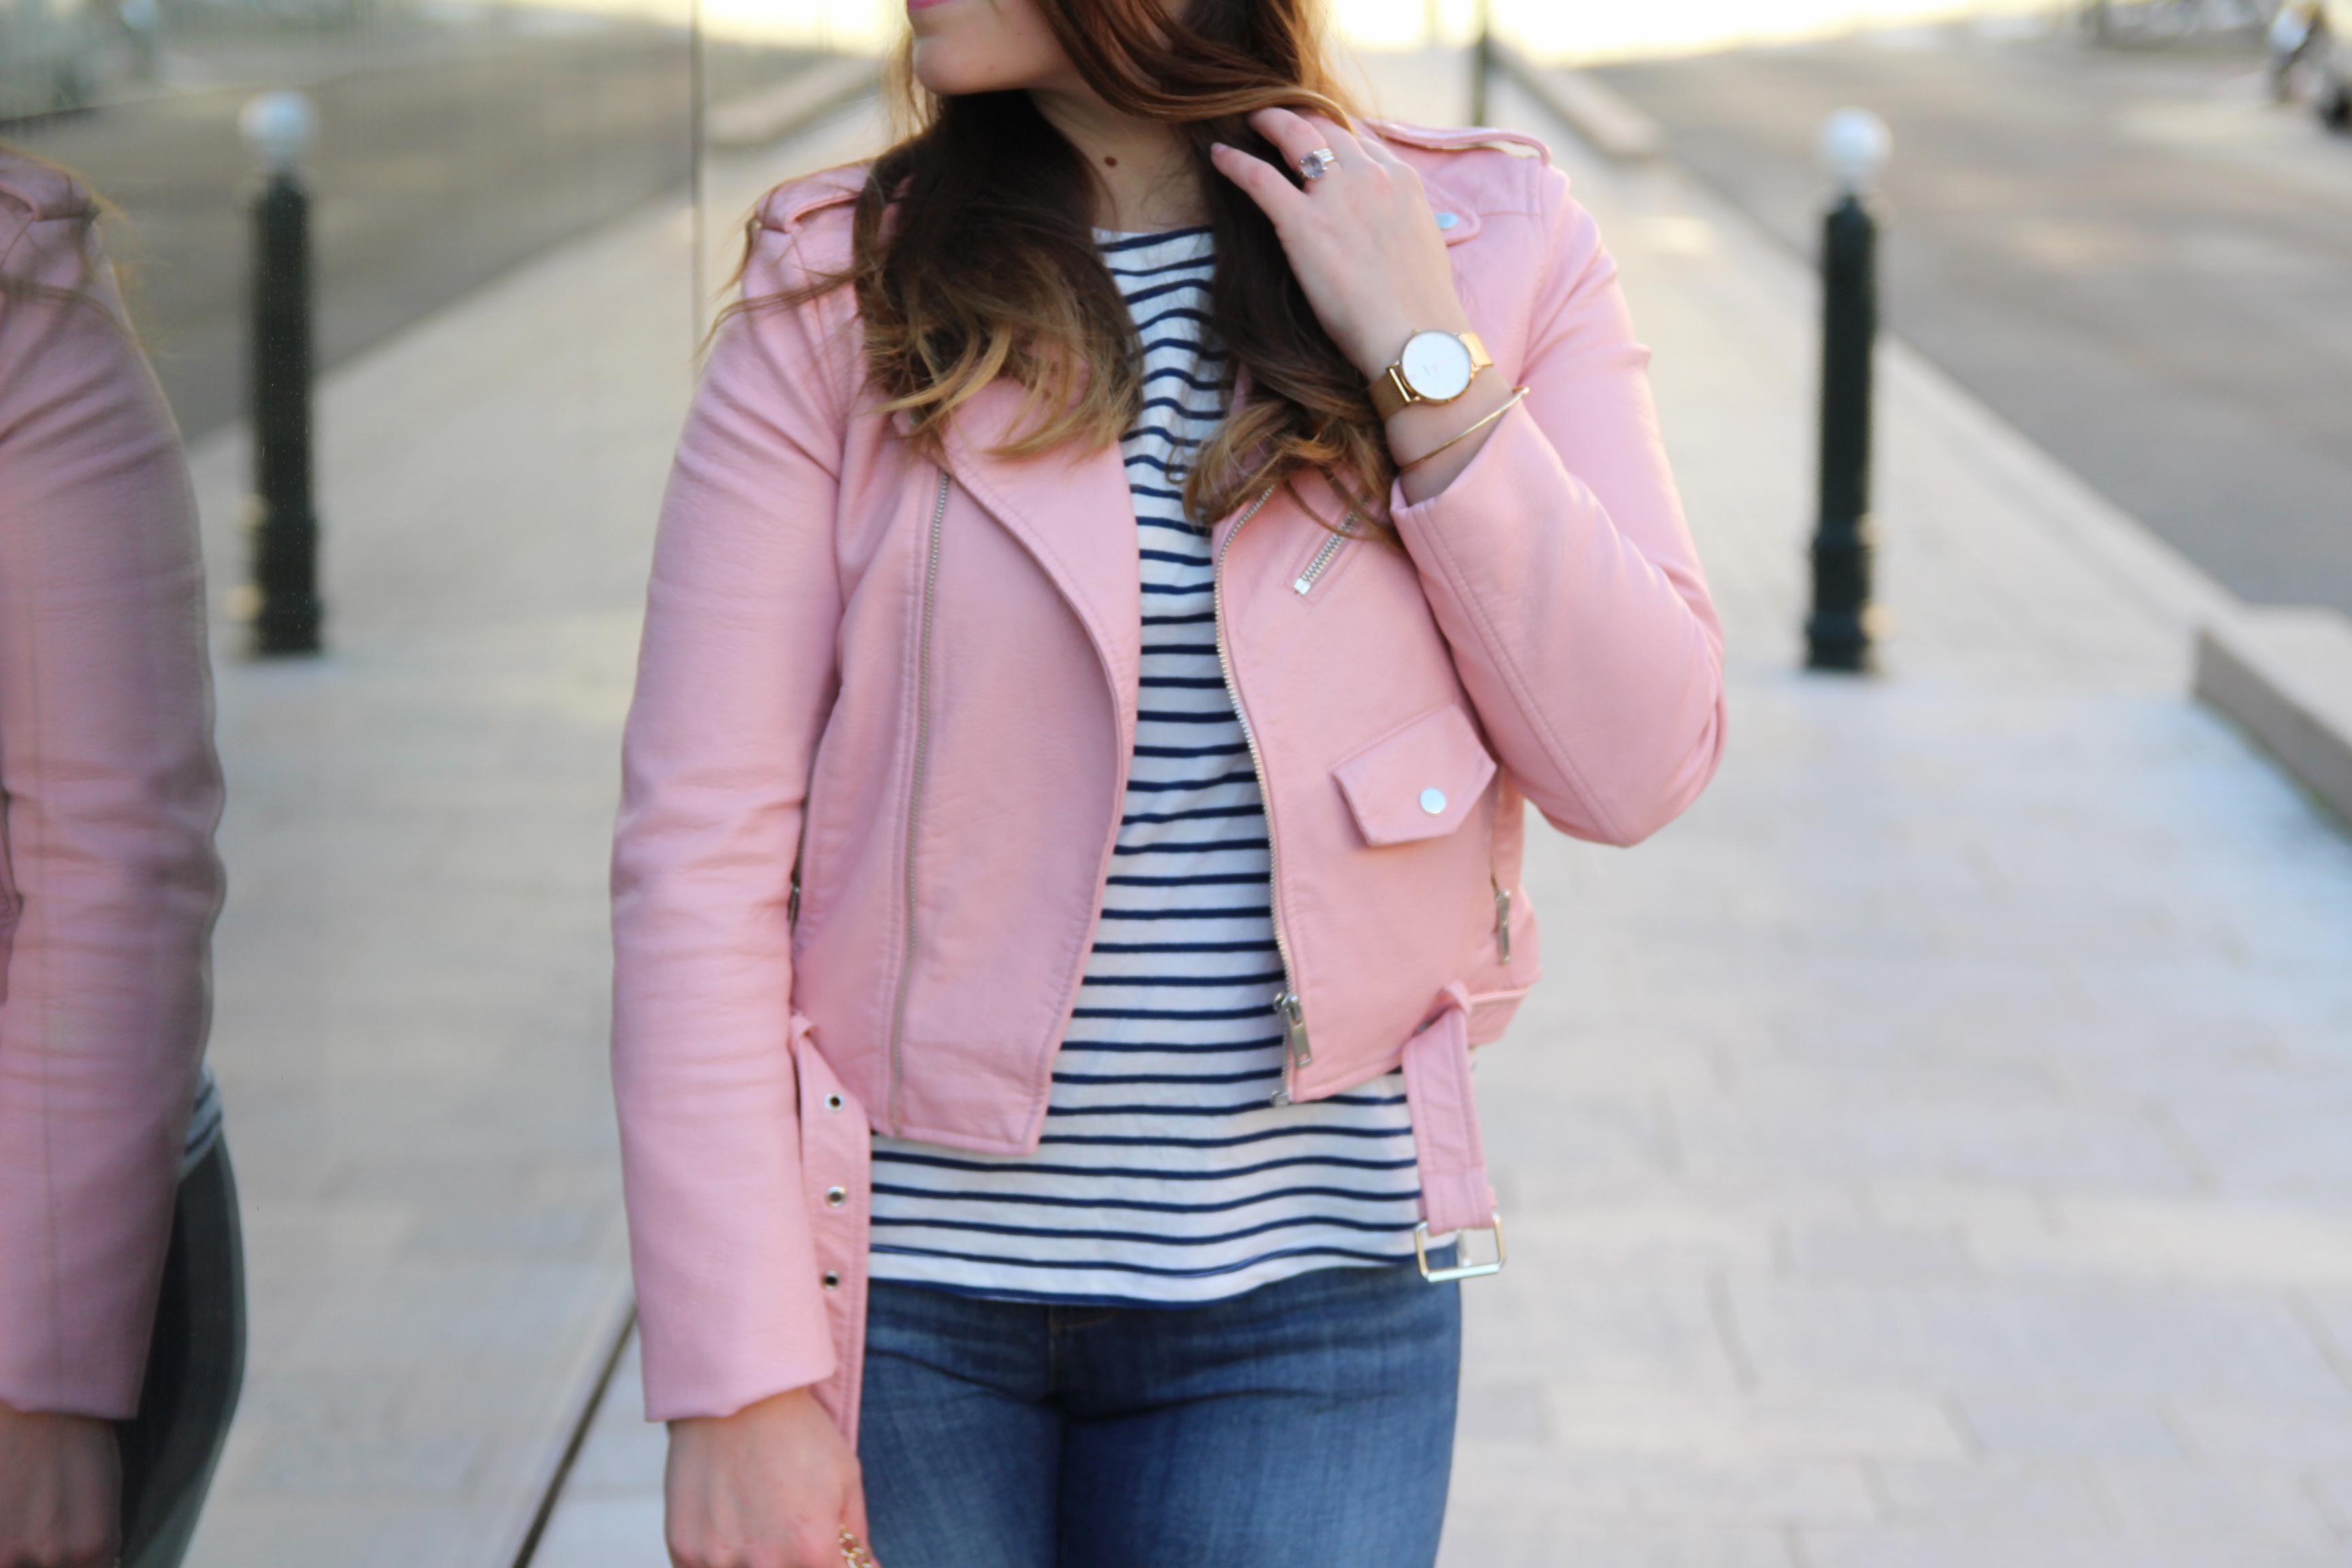 perfecto-rose-zara-marinniere-denim-influencer-fashion-ottd-look-seralynepointcom-paris-IMG_7020